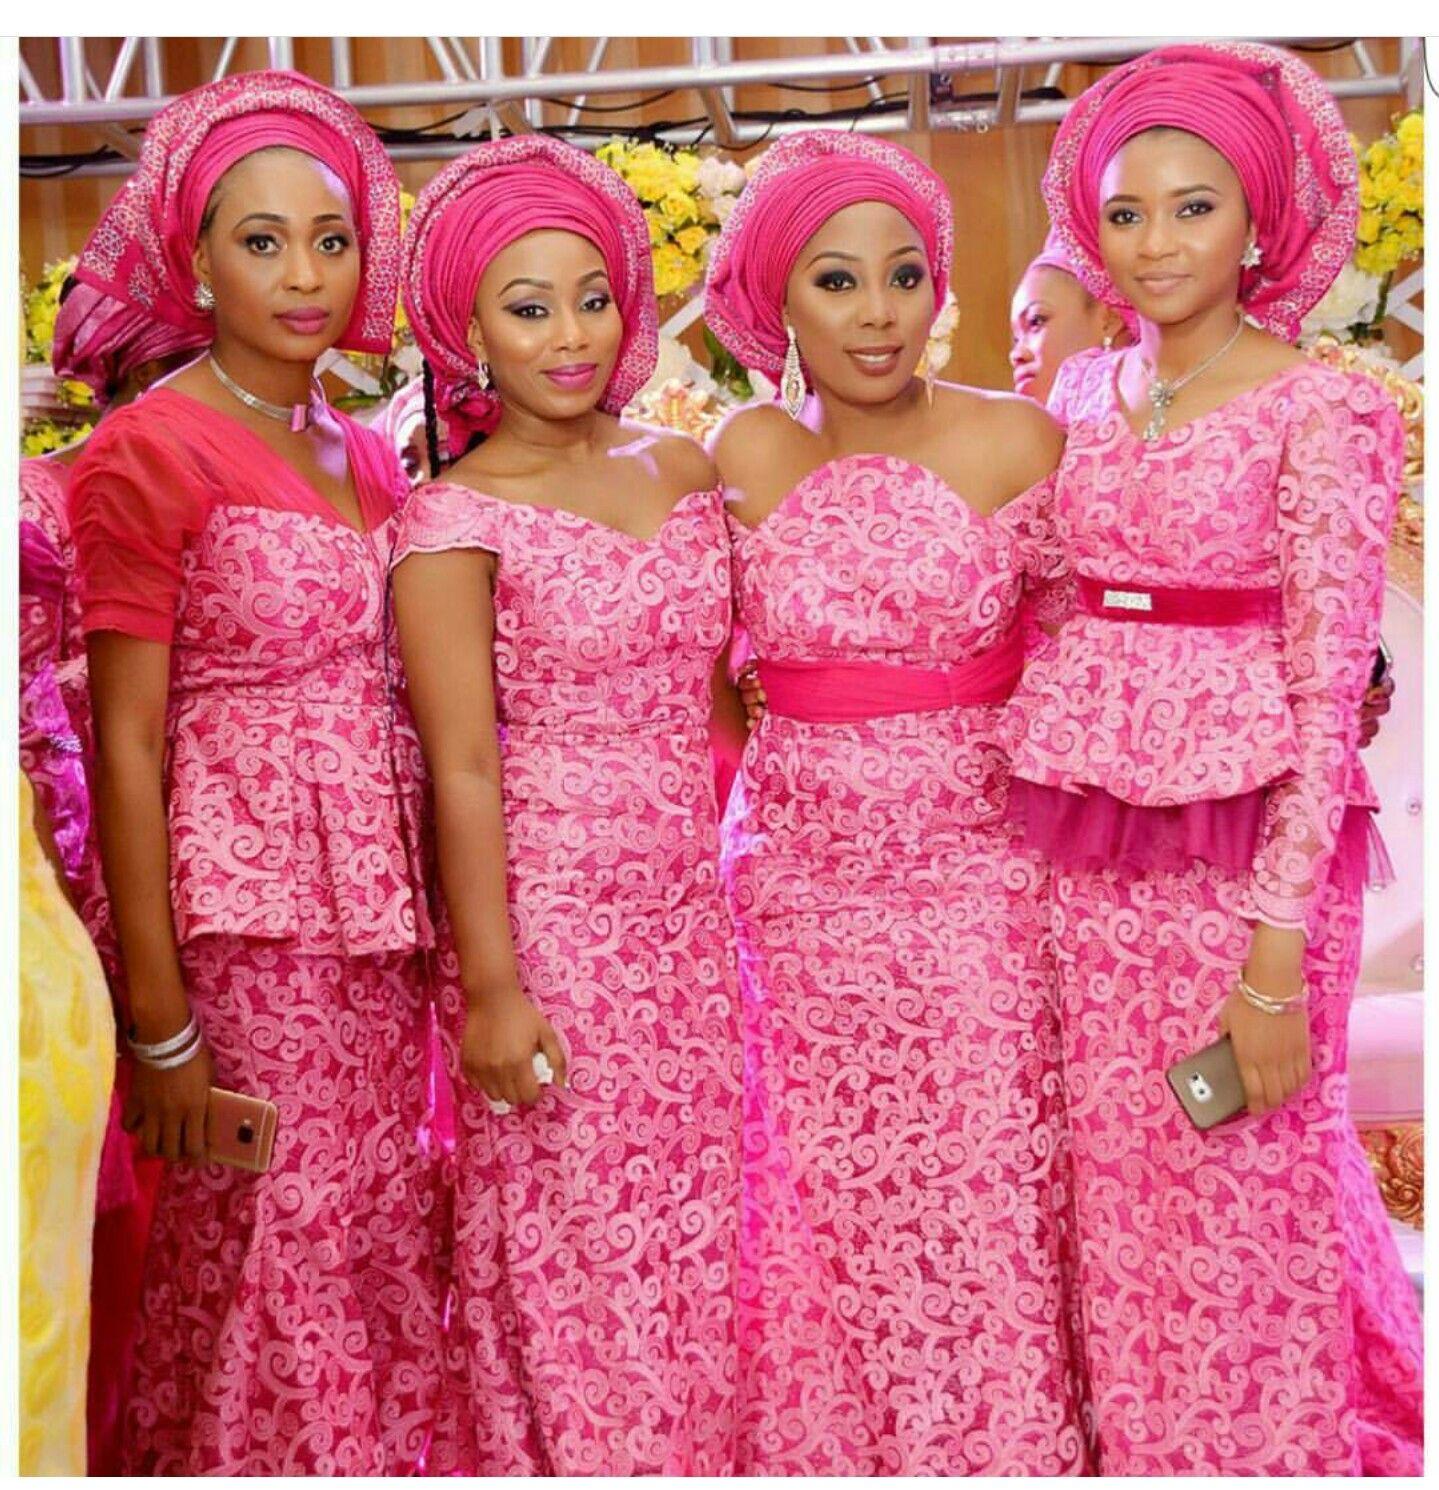 Pin de chinenye osuji en African Fashion   Pinterest